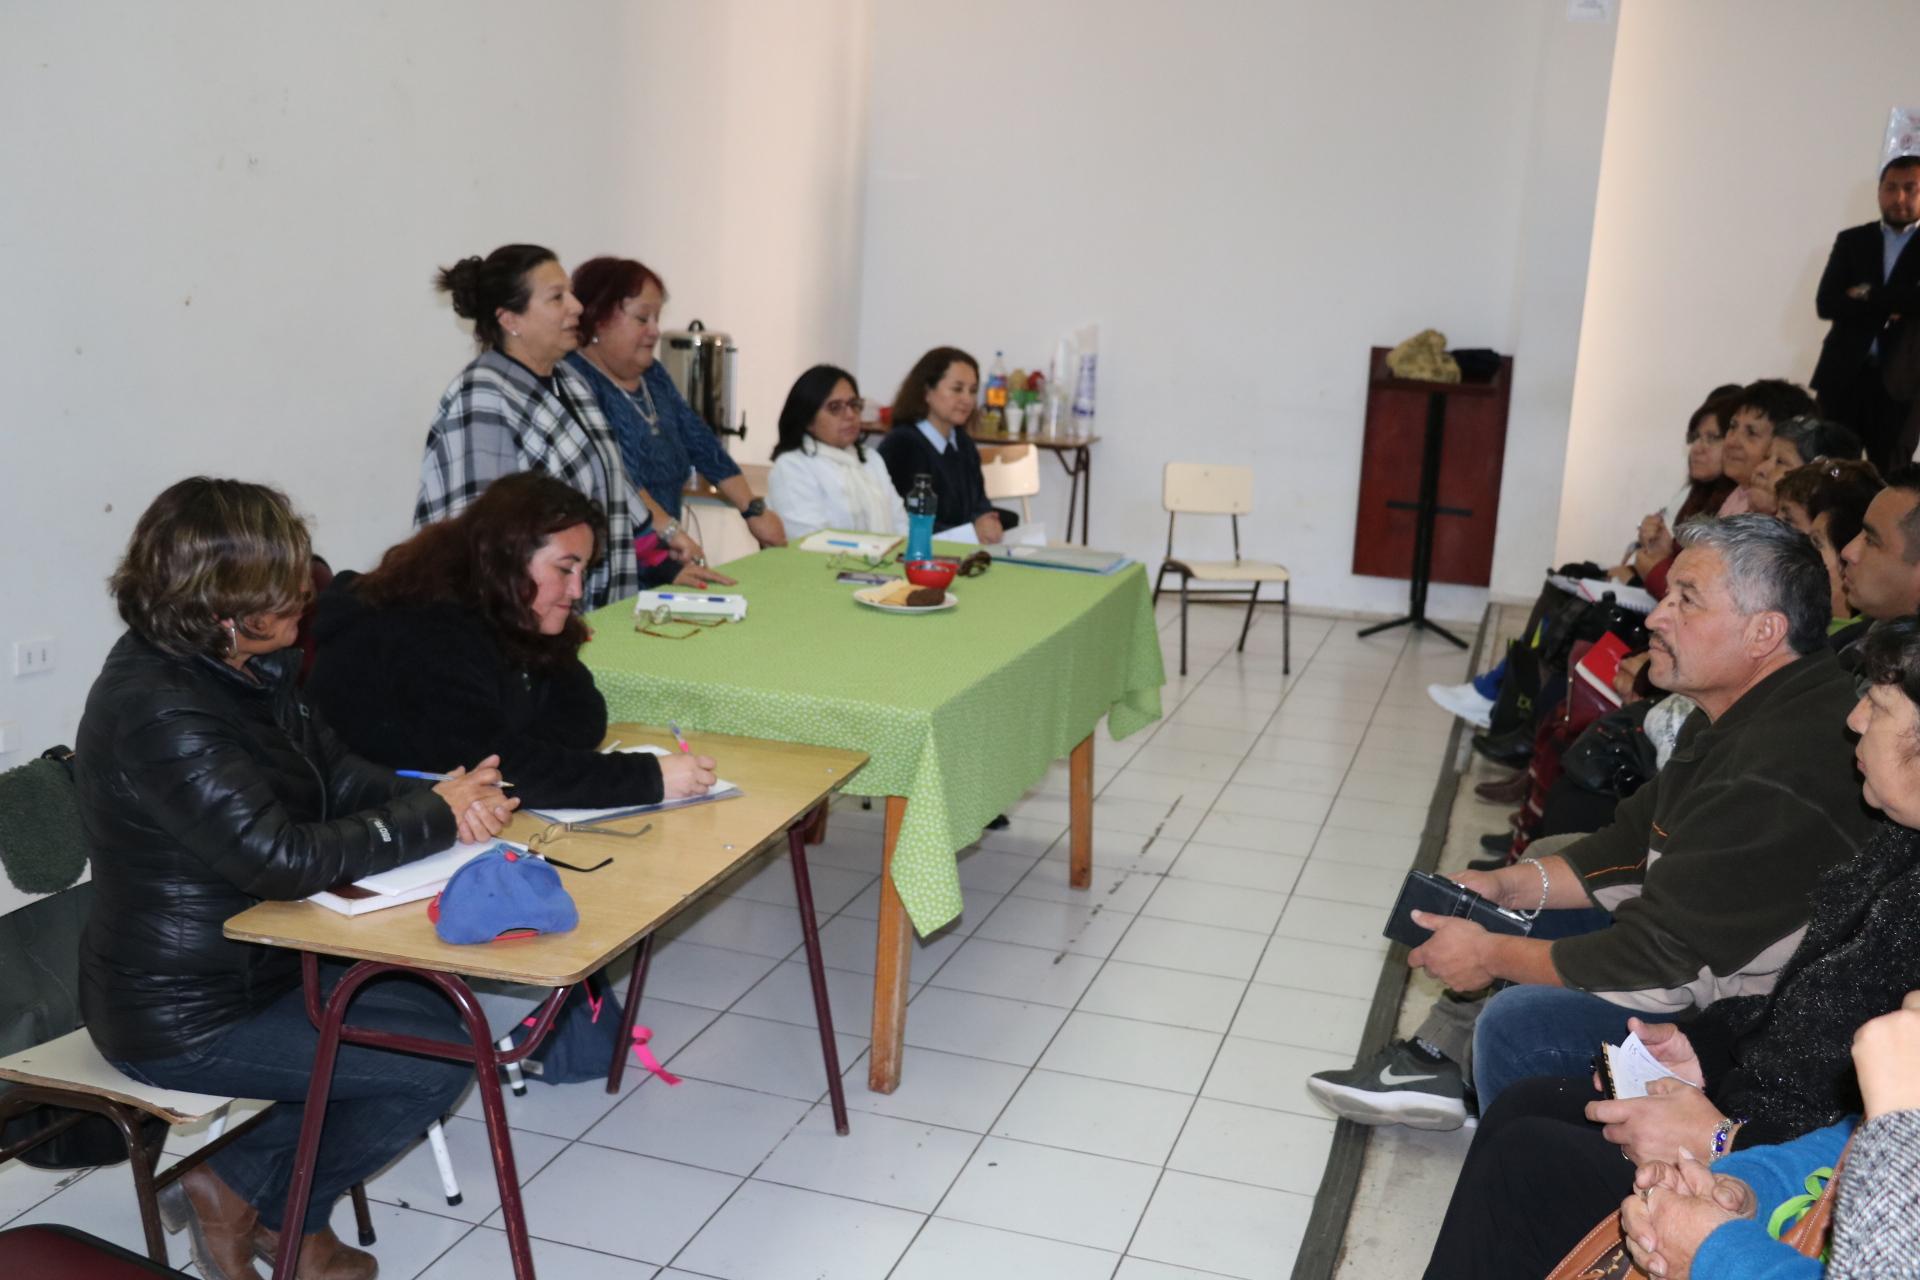 Gobernadora del Huasco, Nelly Galeb destaca labor de dirigentes rurales